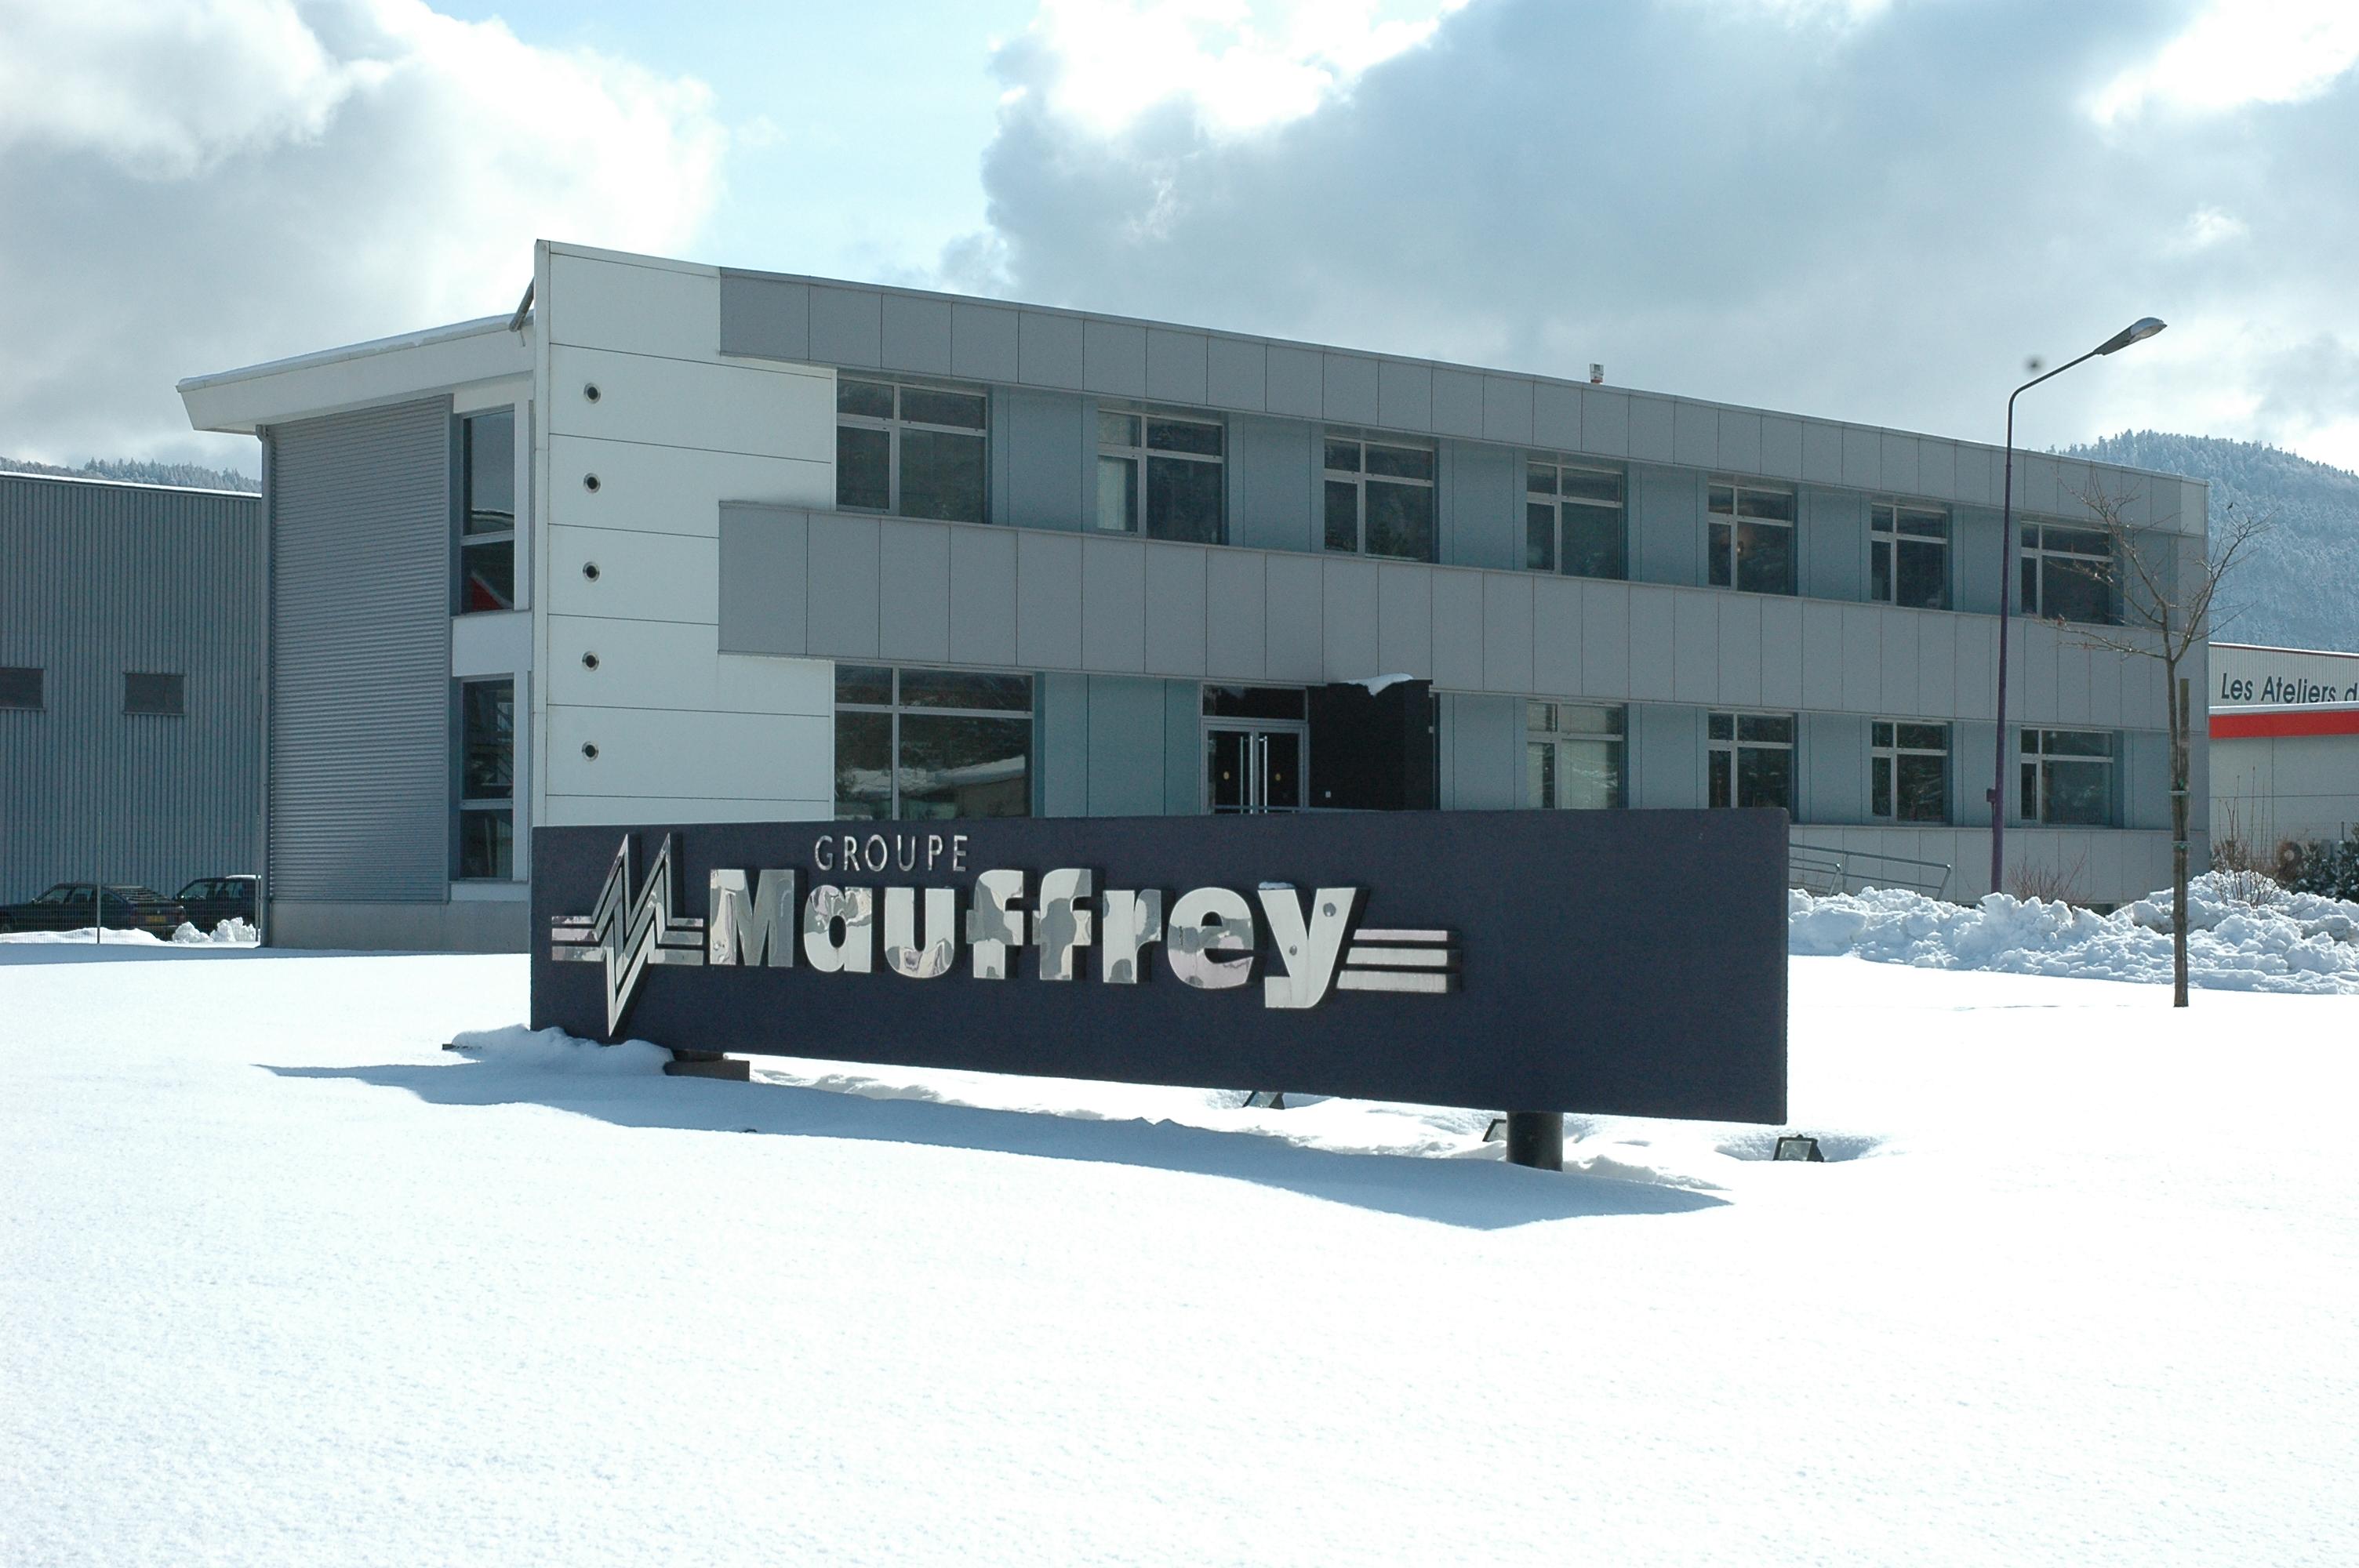 Groupe-Mauffrey-notre-histoire-Holding-Financiere